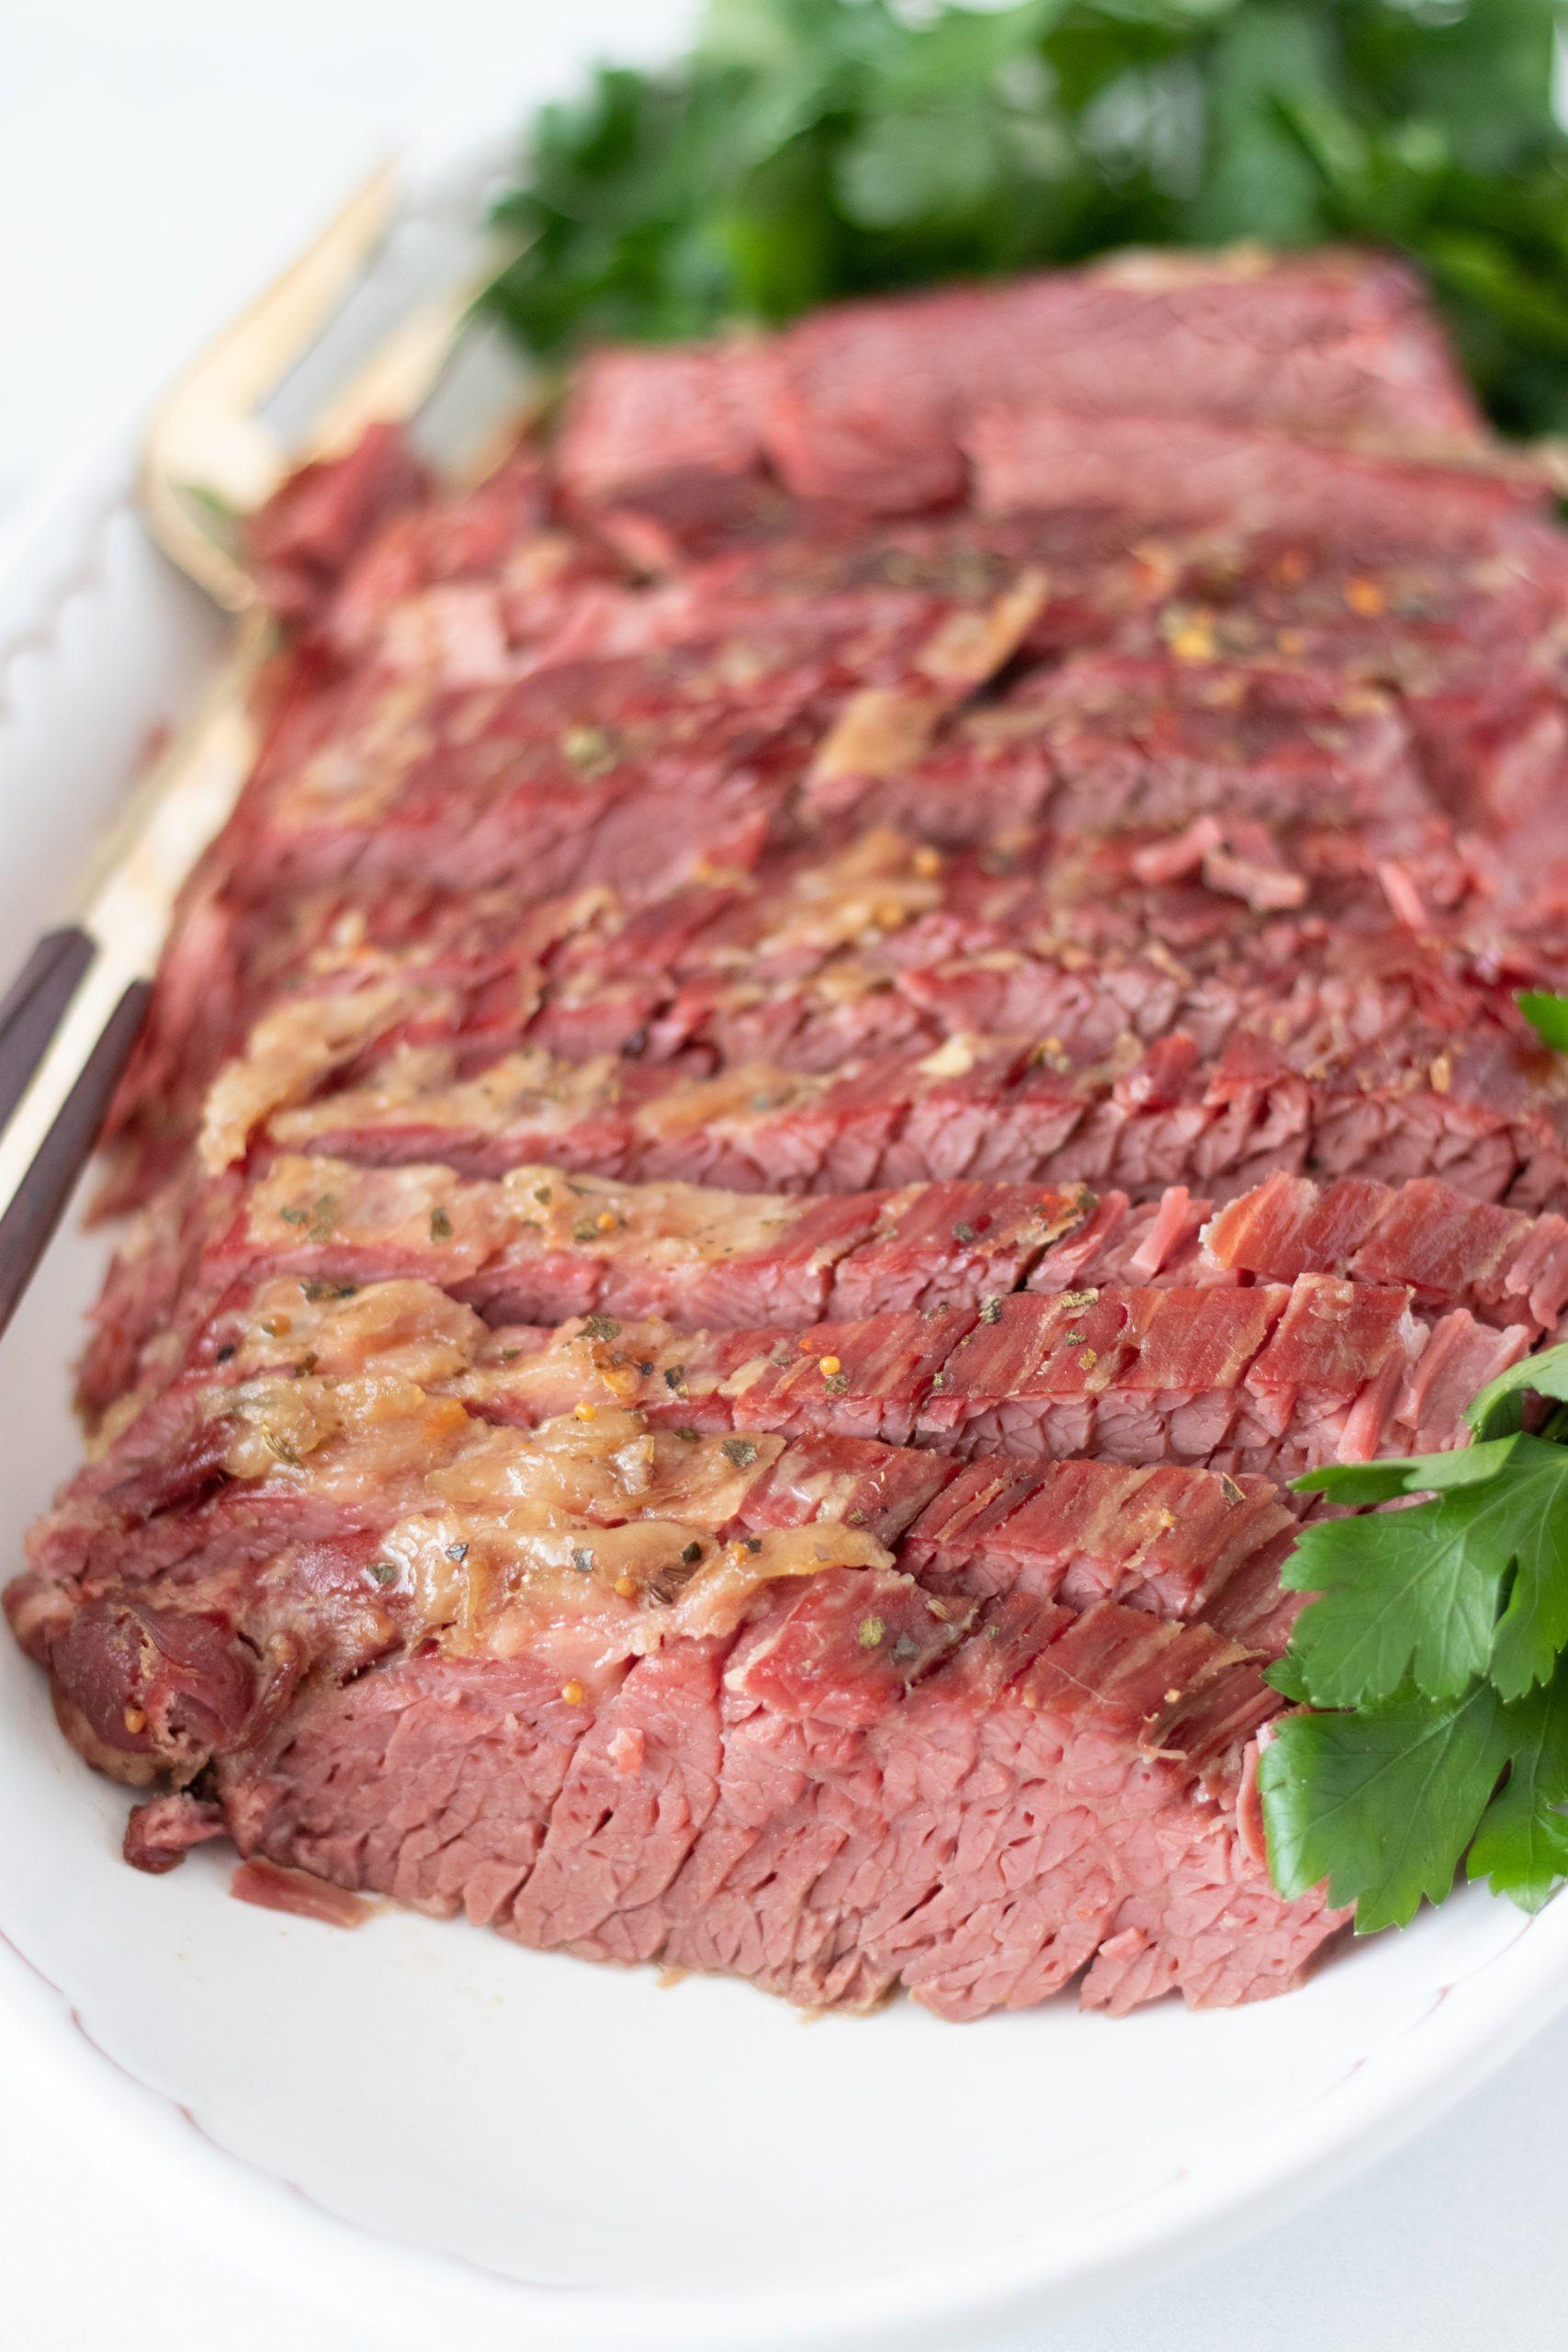 Corned Beef Brisket 3 Ways To Make The Grove Bend Kitchen Recipe In 2020 Corned Beef Brisket Corn Beef Brisket Recipe Beef Brisket Oven